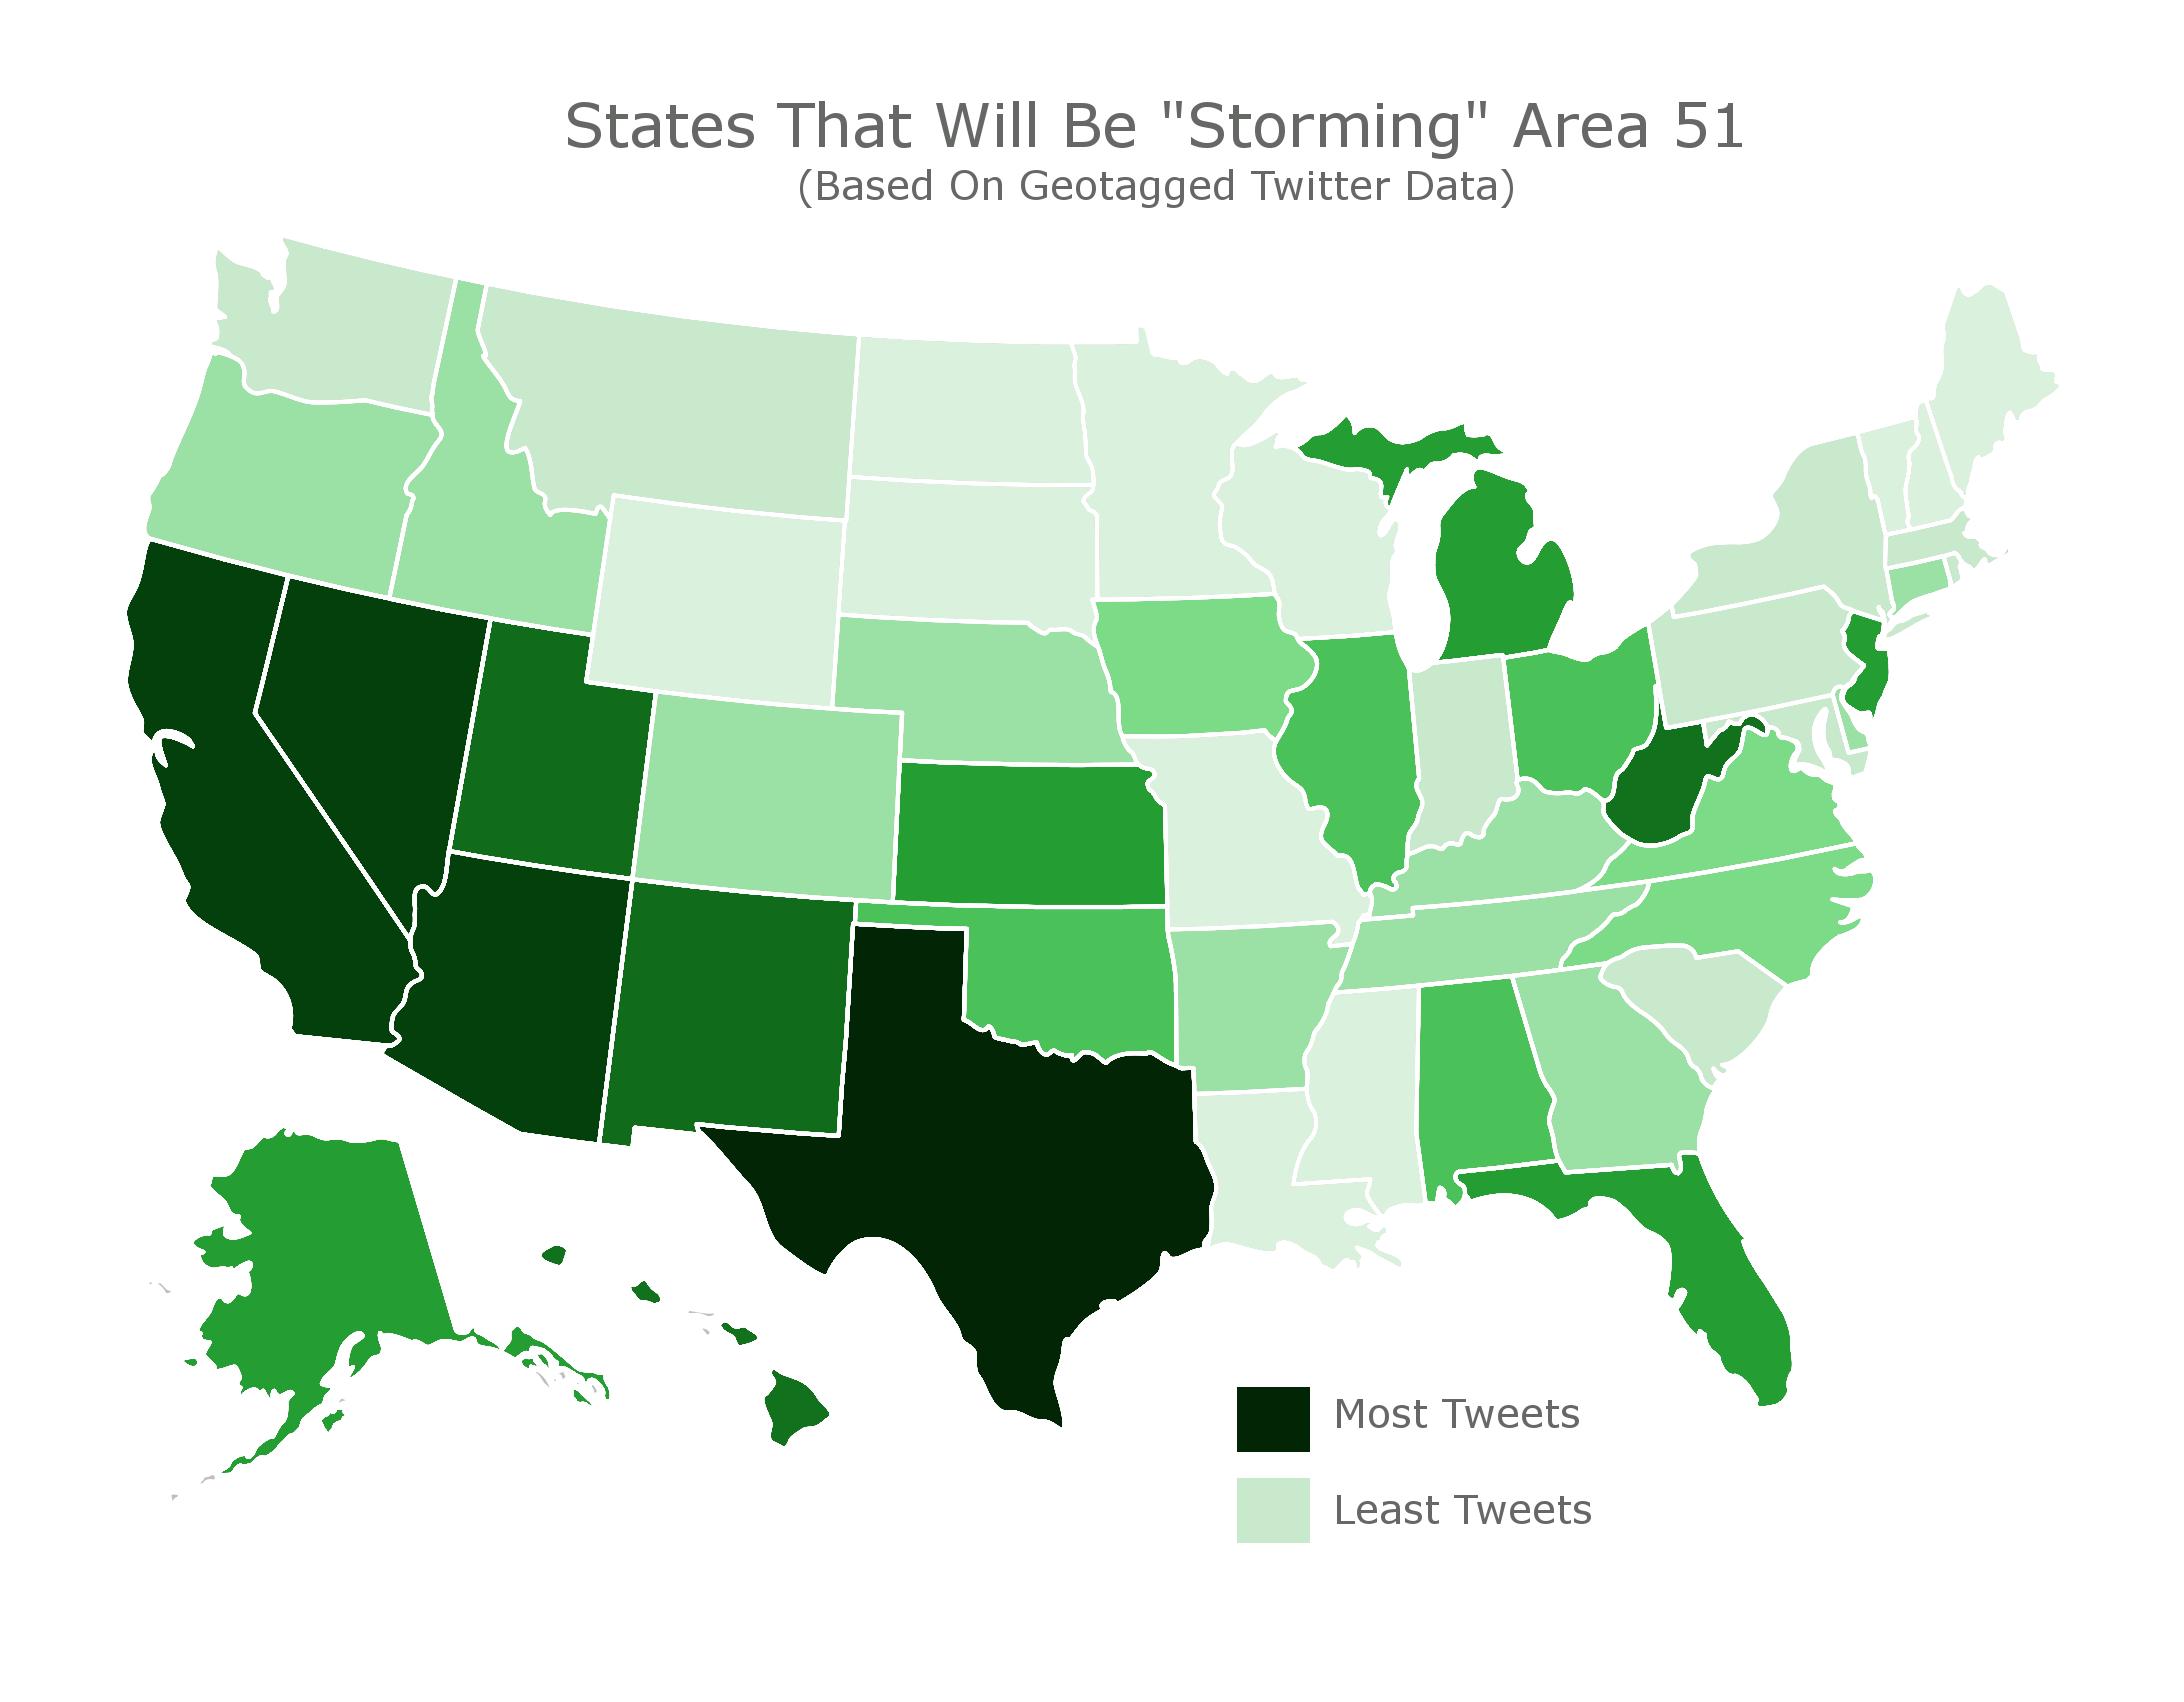 Area 51 Storming (Credit: dankgeek.com)